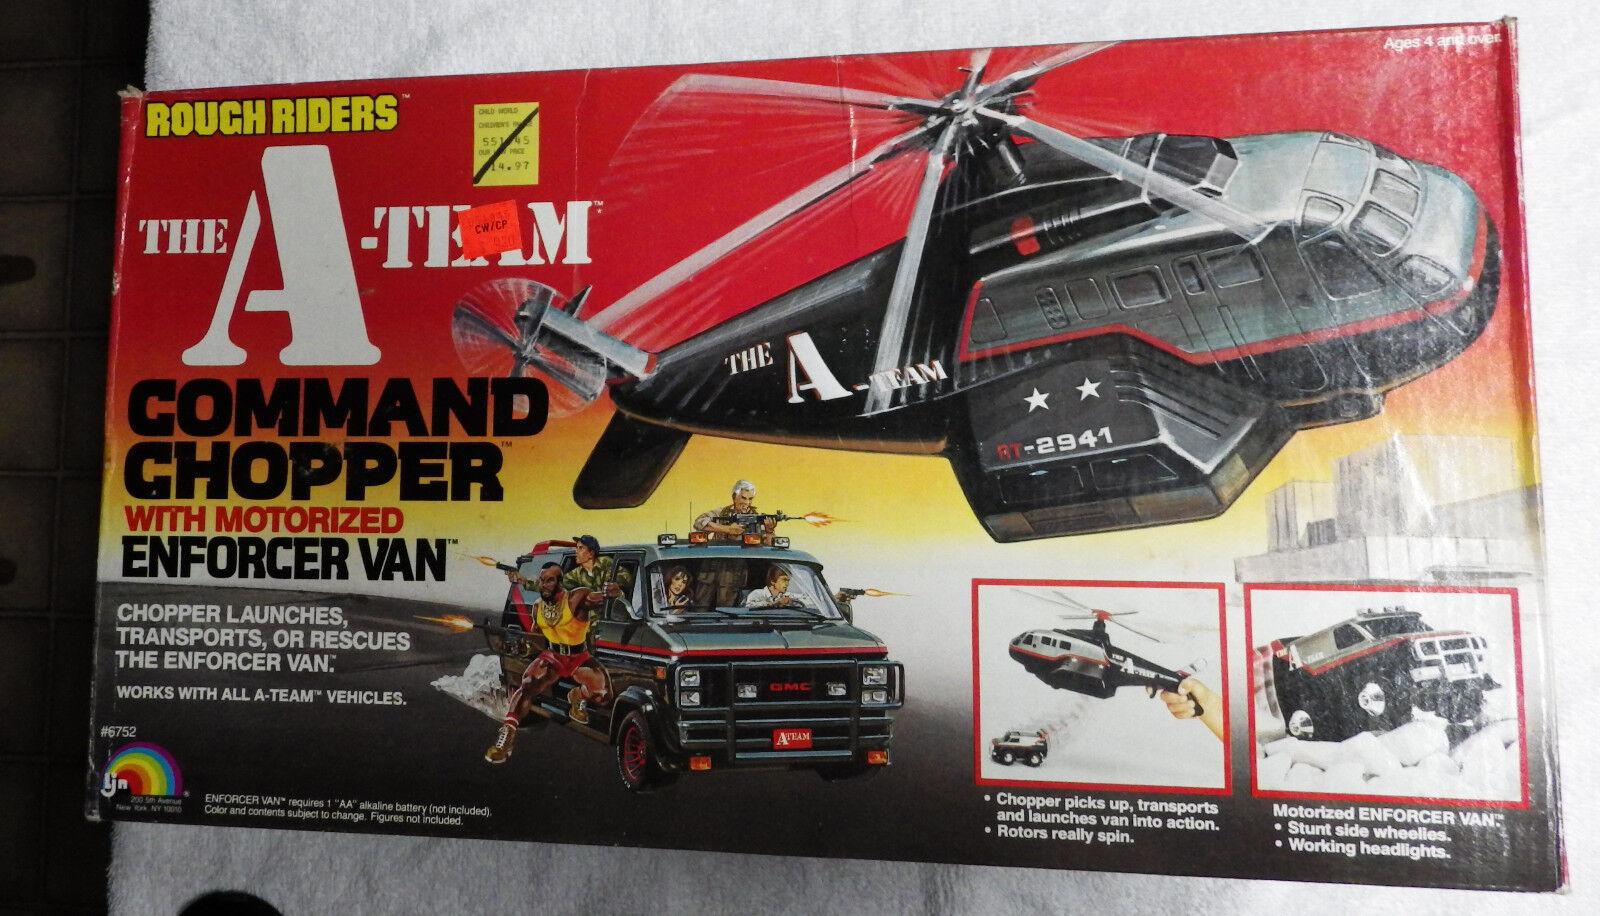 1983 LJN the A-TEAM Rough Riders COMMAND CHOPPER w  Enforcer Van playset MIB